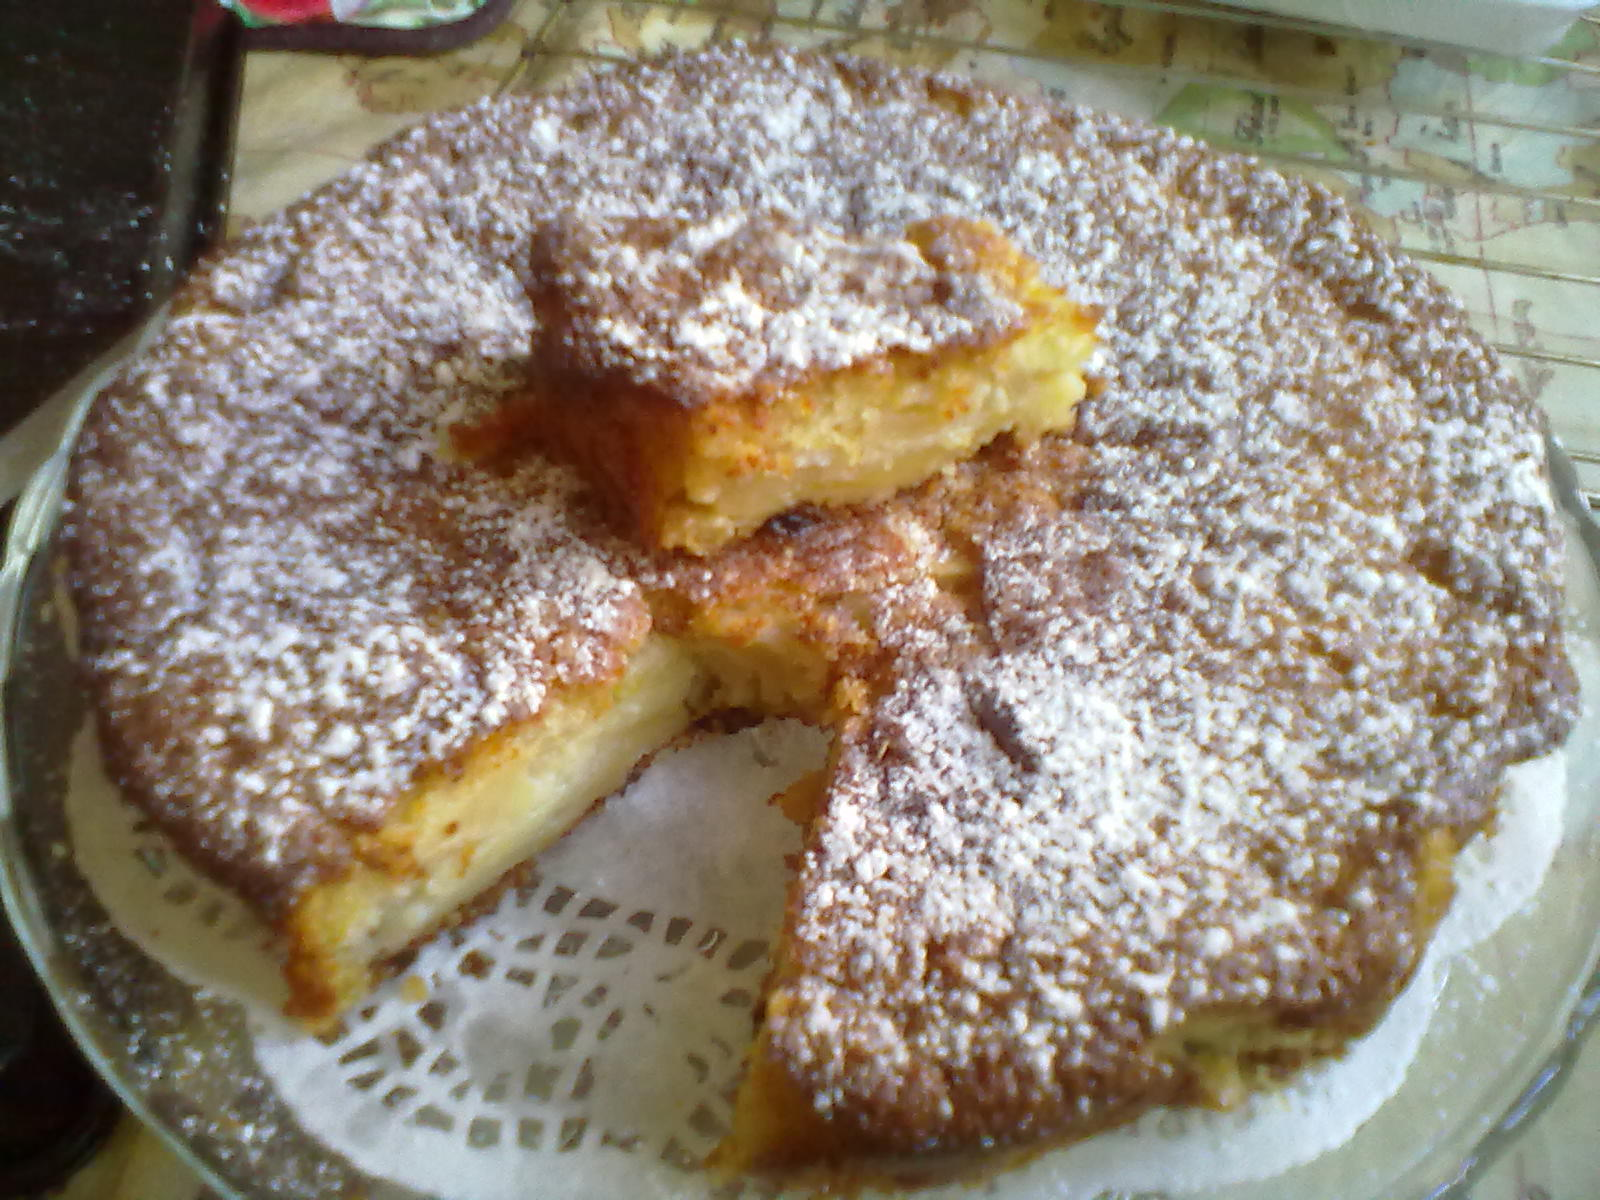 Torta Di Mele Di Suor Germana Ricetta Facile In Cucina Con